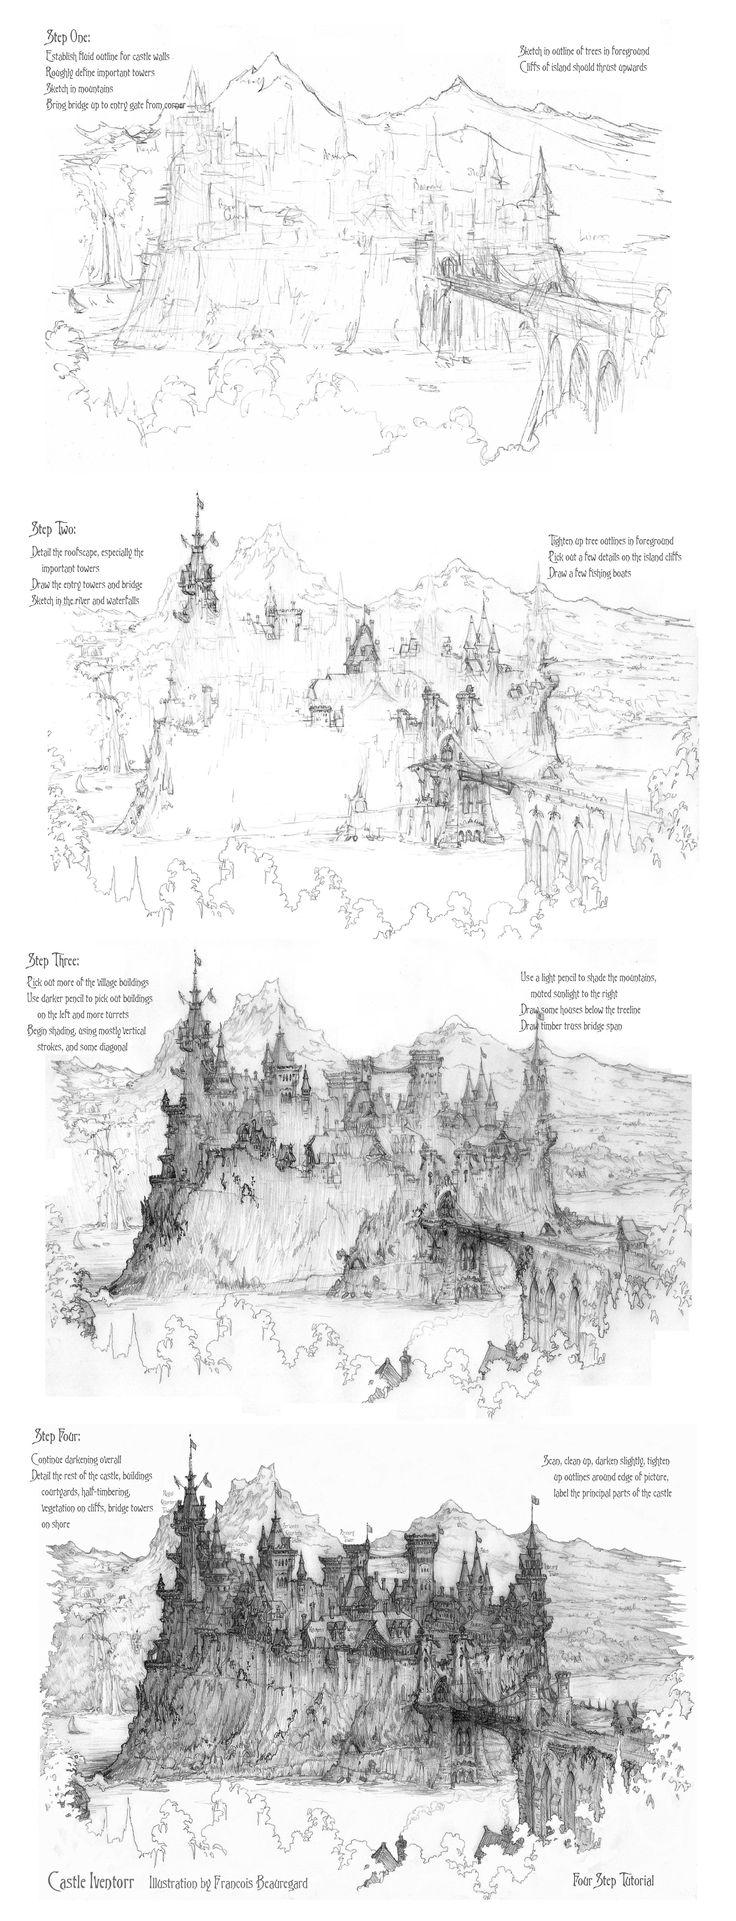 orig10.deviantart.net e8f6 f 2012 325 7 2 four_step_castle_drawing_tutorial_by_built4ever-d5lqt8k.jpg